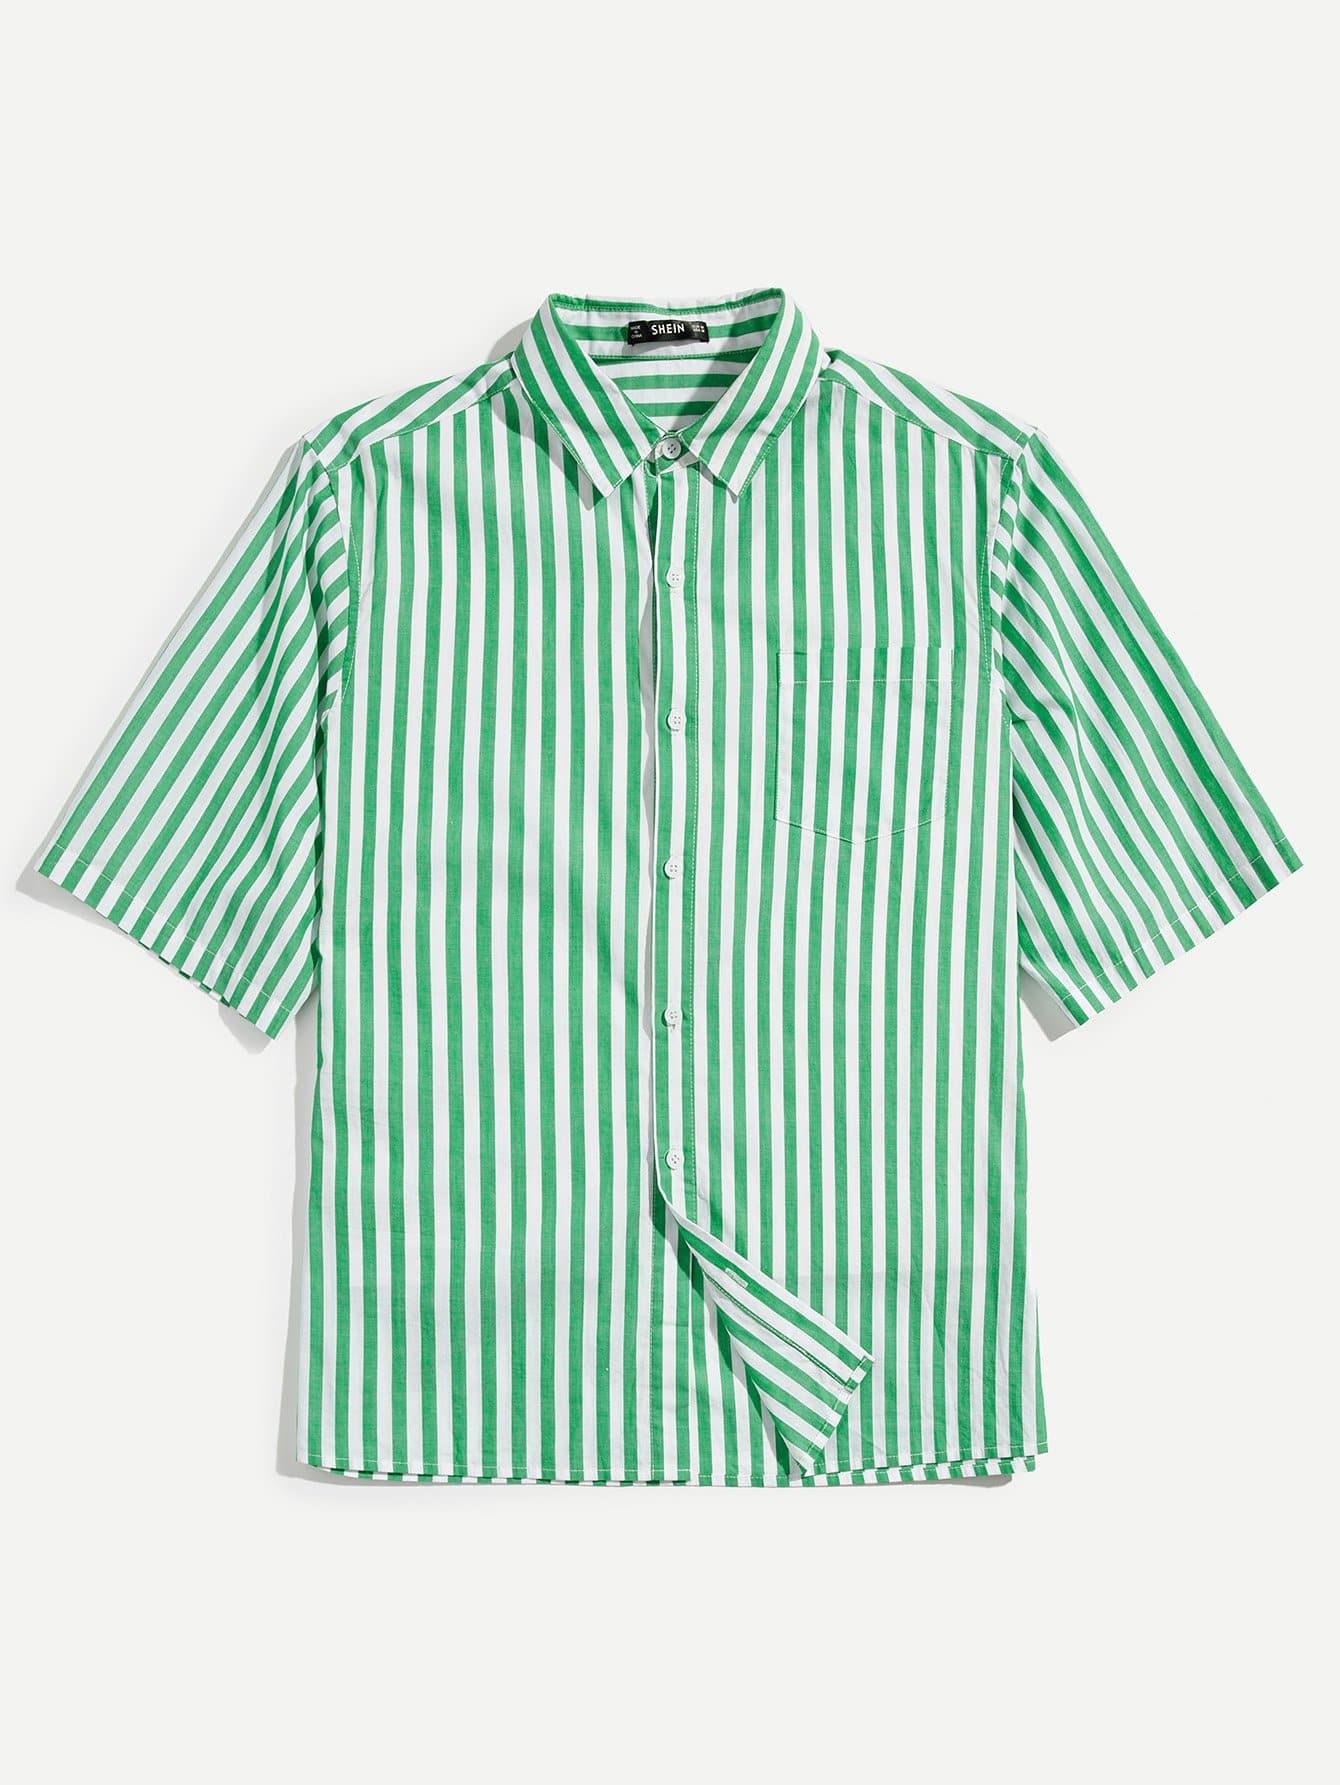 Men Button & Pocket Front Striped Top striped front pocket tank top